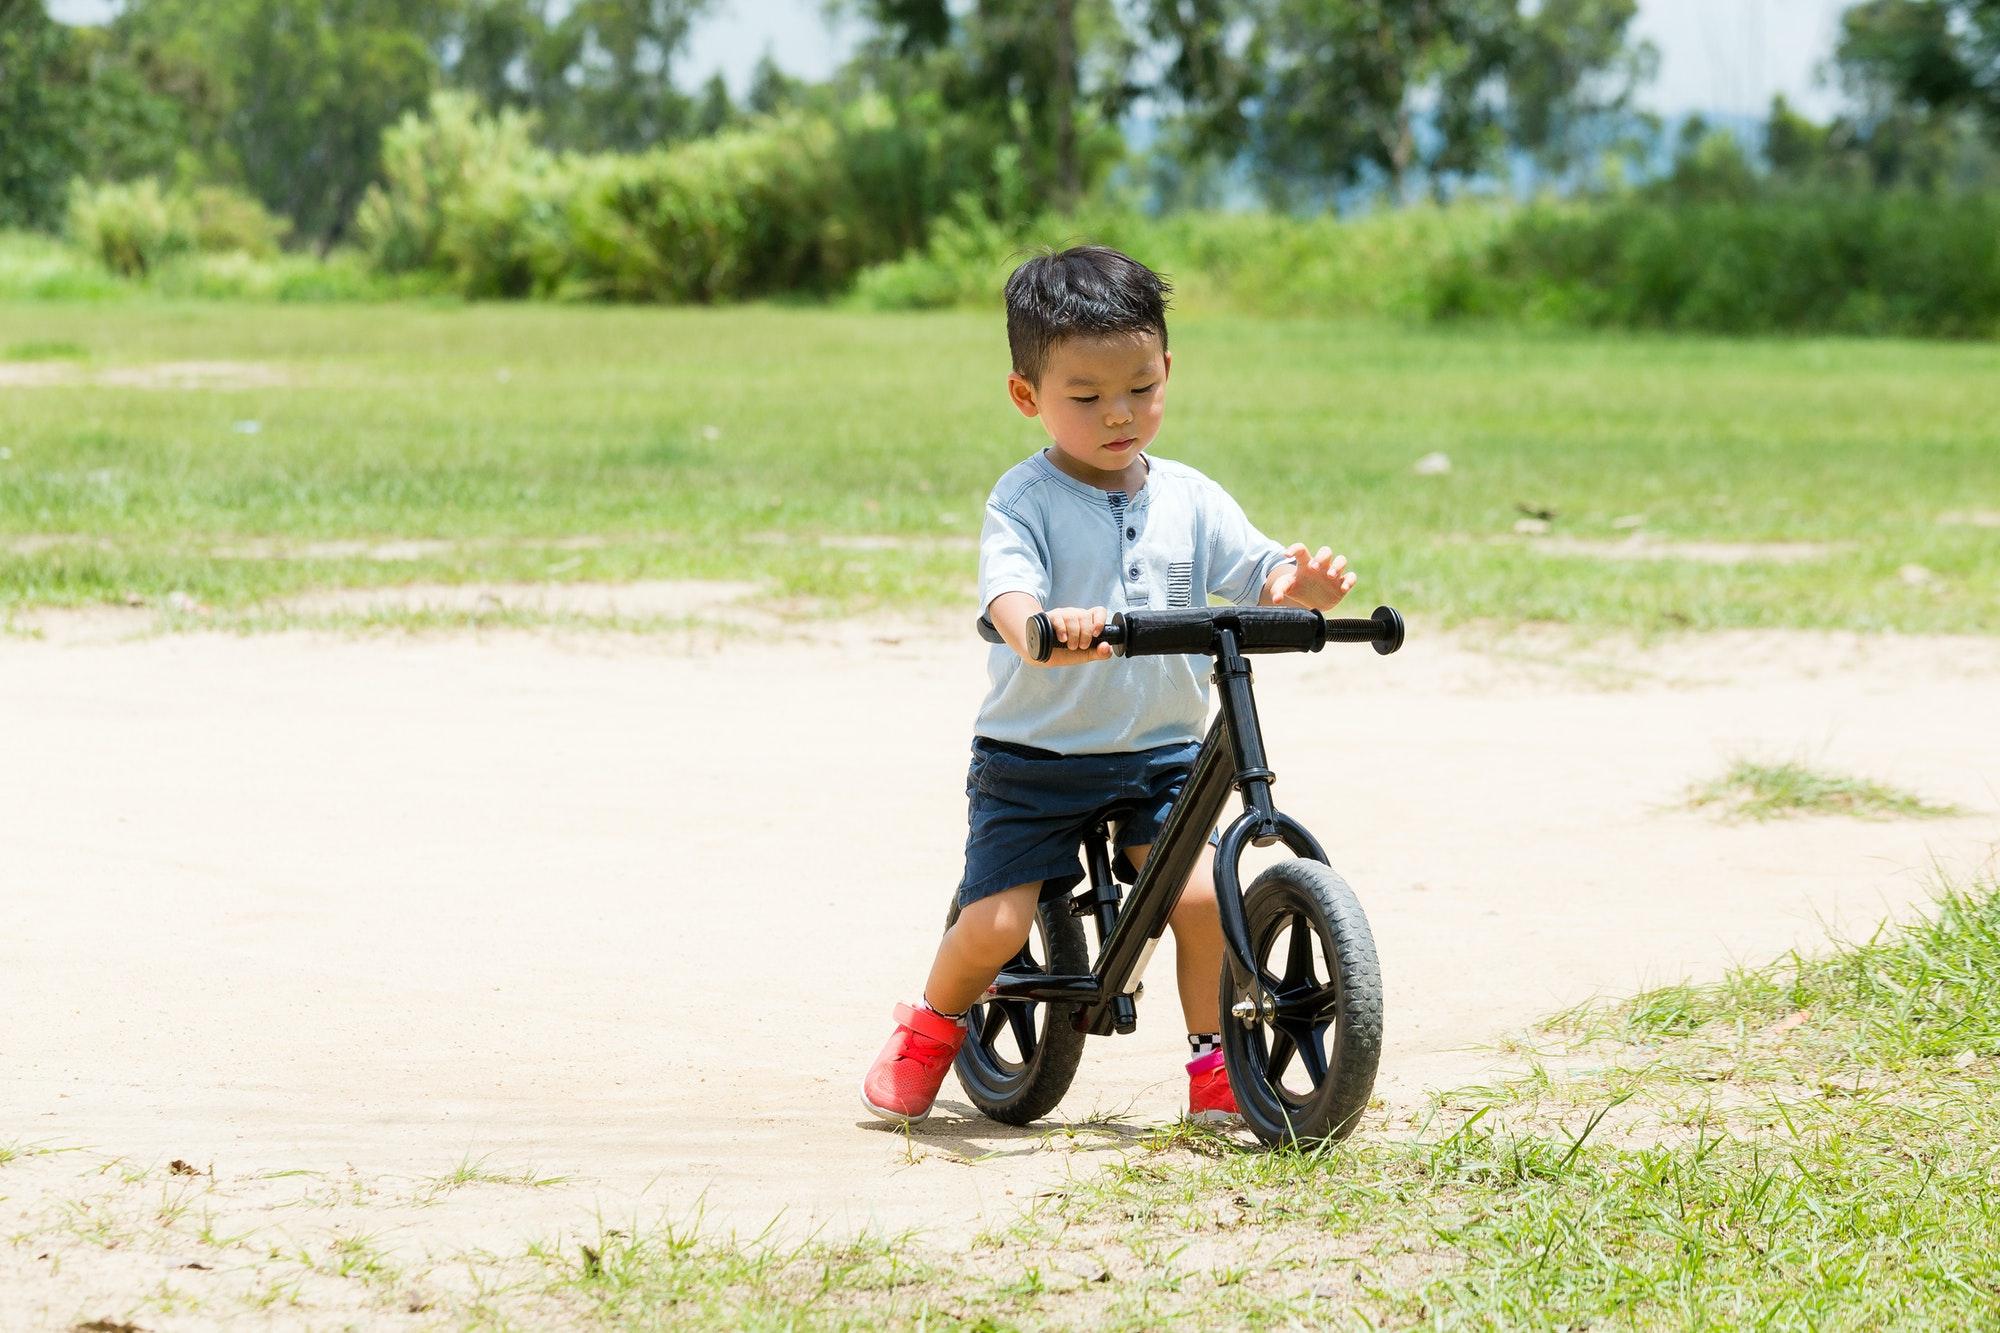 Small kid riding a bike